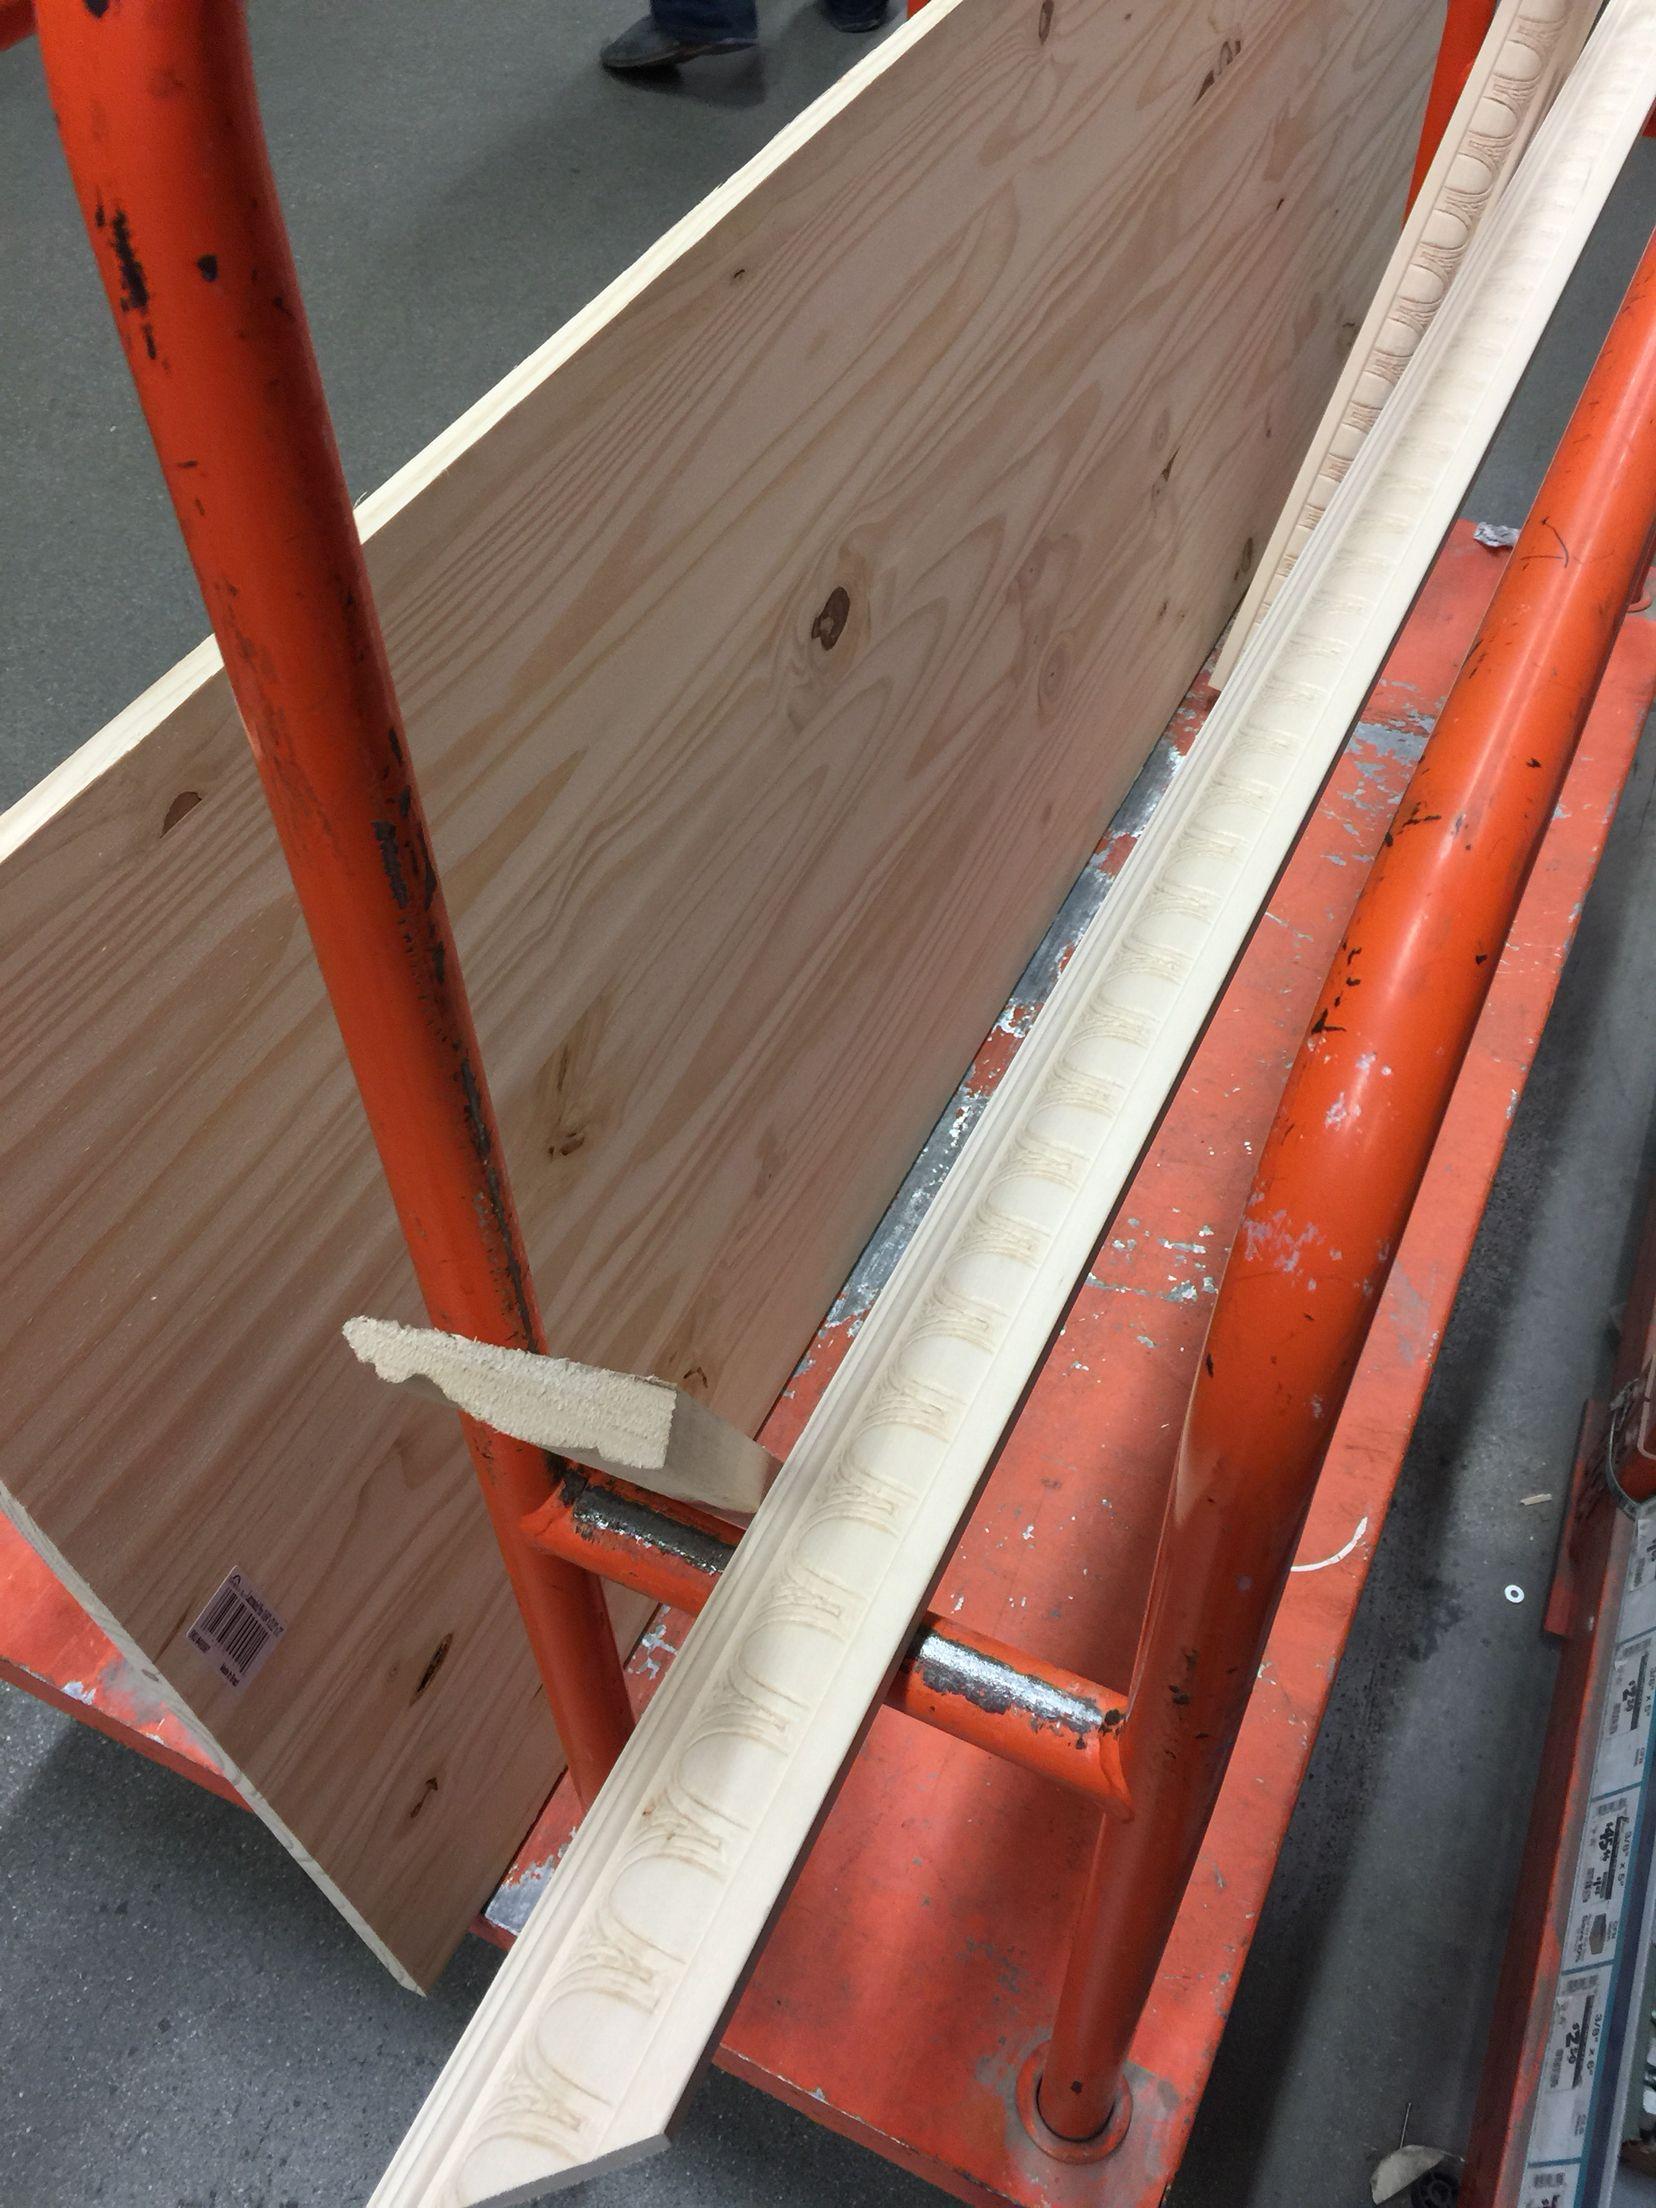 Wood Board From Home Depot Diy Headboard Wood Board Home Depot